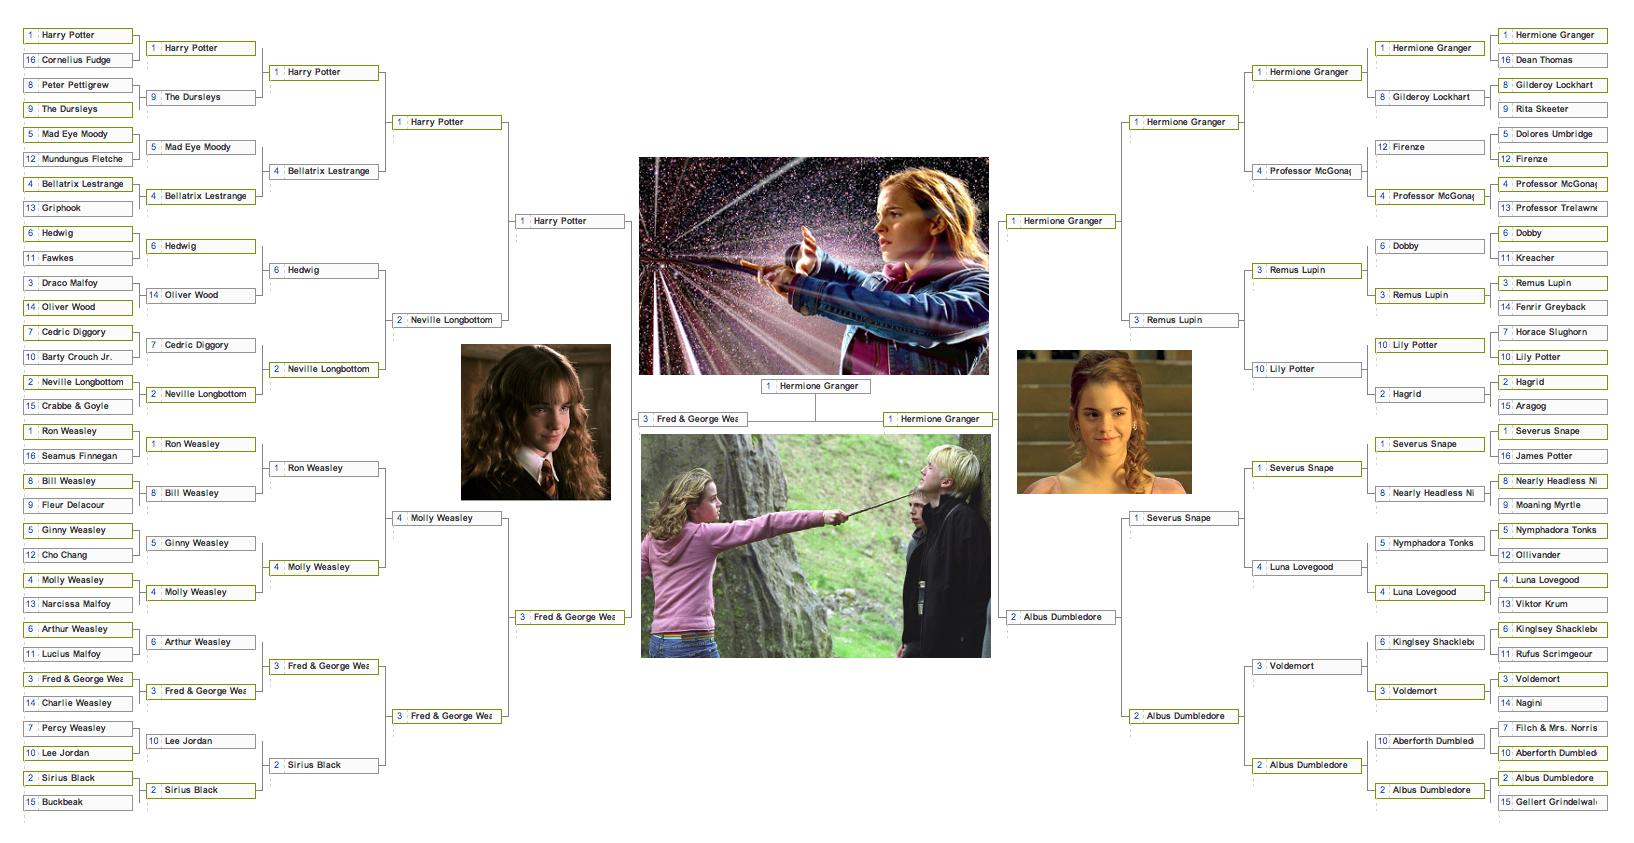 100 Book Hermione Vs Movie Hermione Hermione Granger